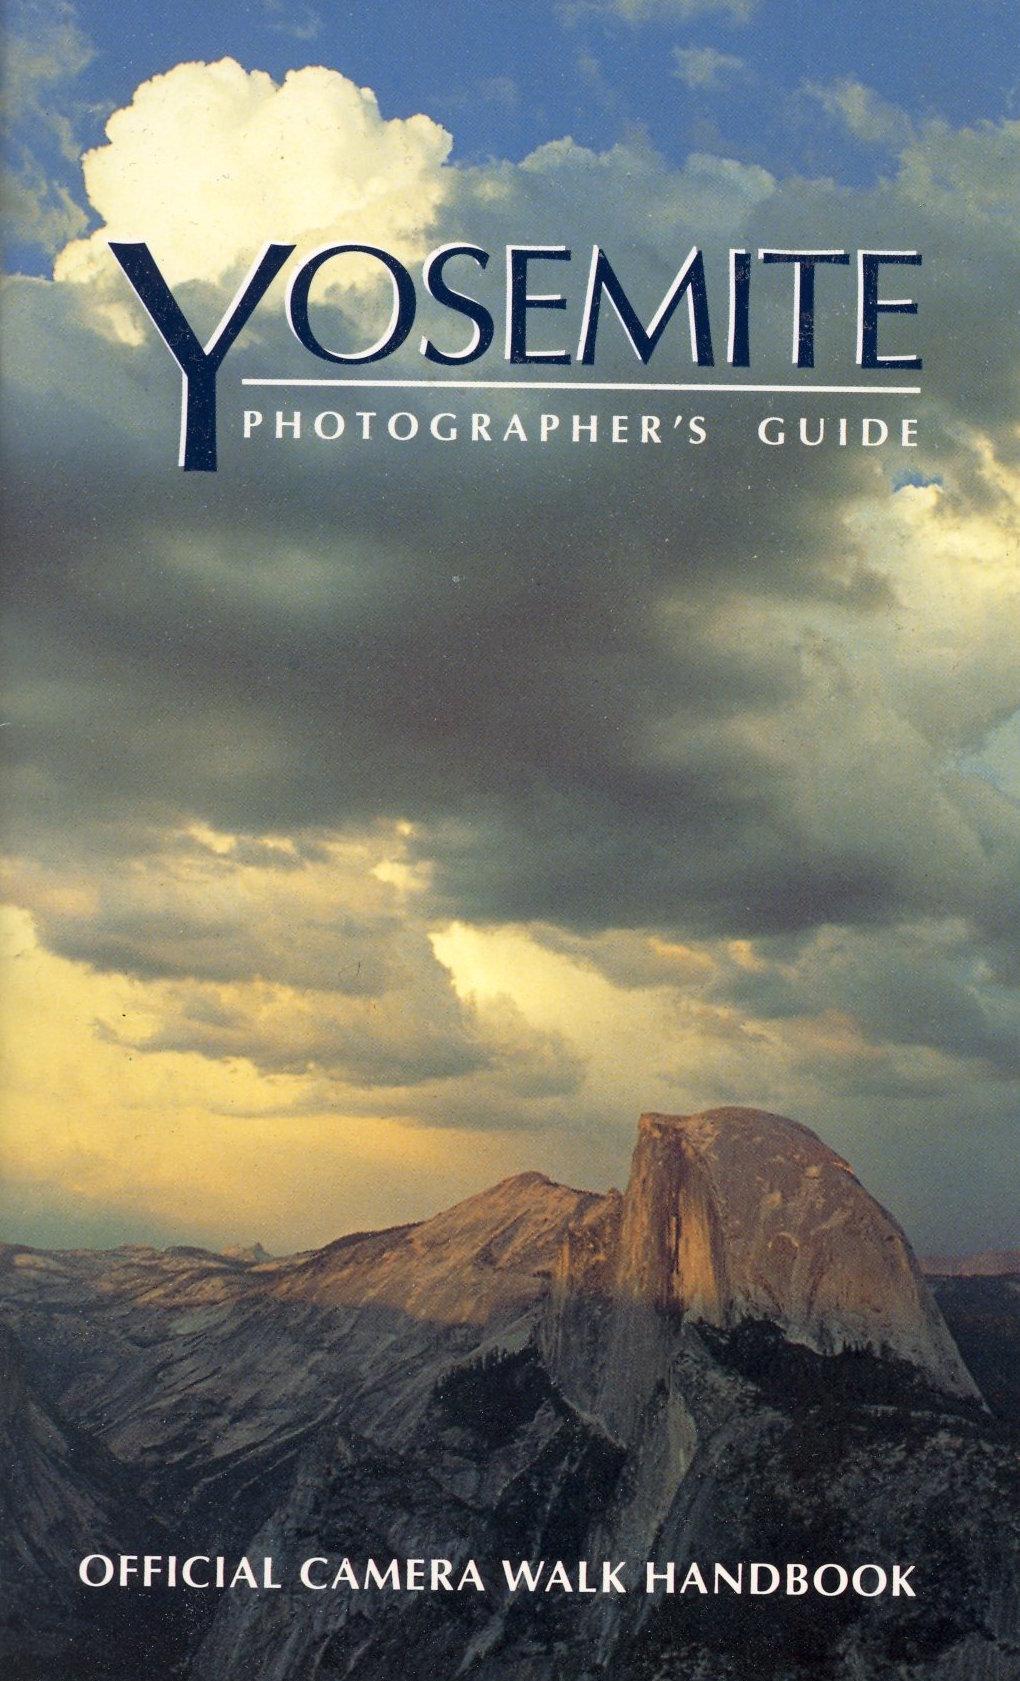 Yosemite Photographer's Guide; Official Camera Walk Handbook